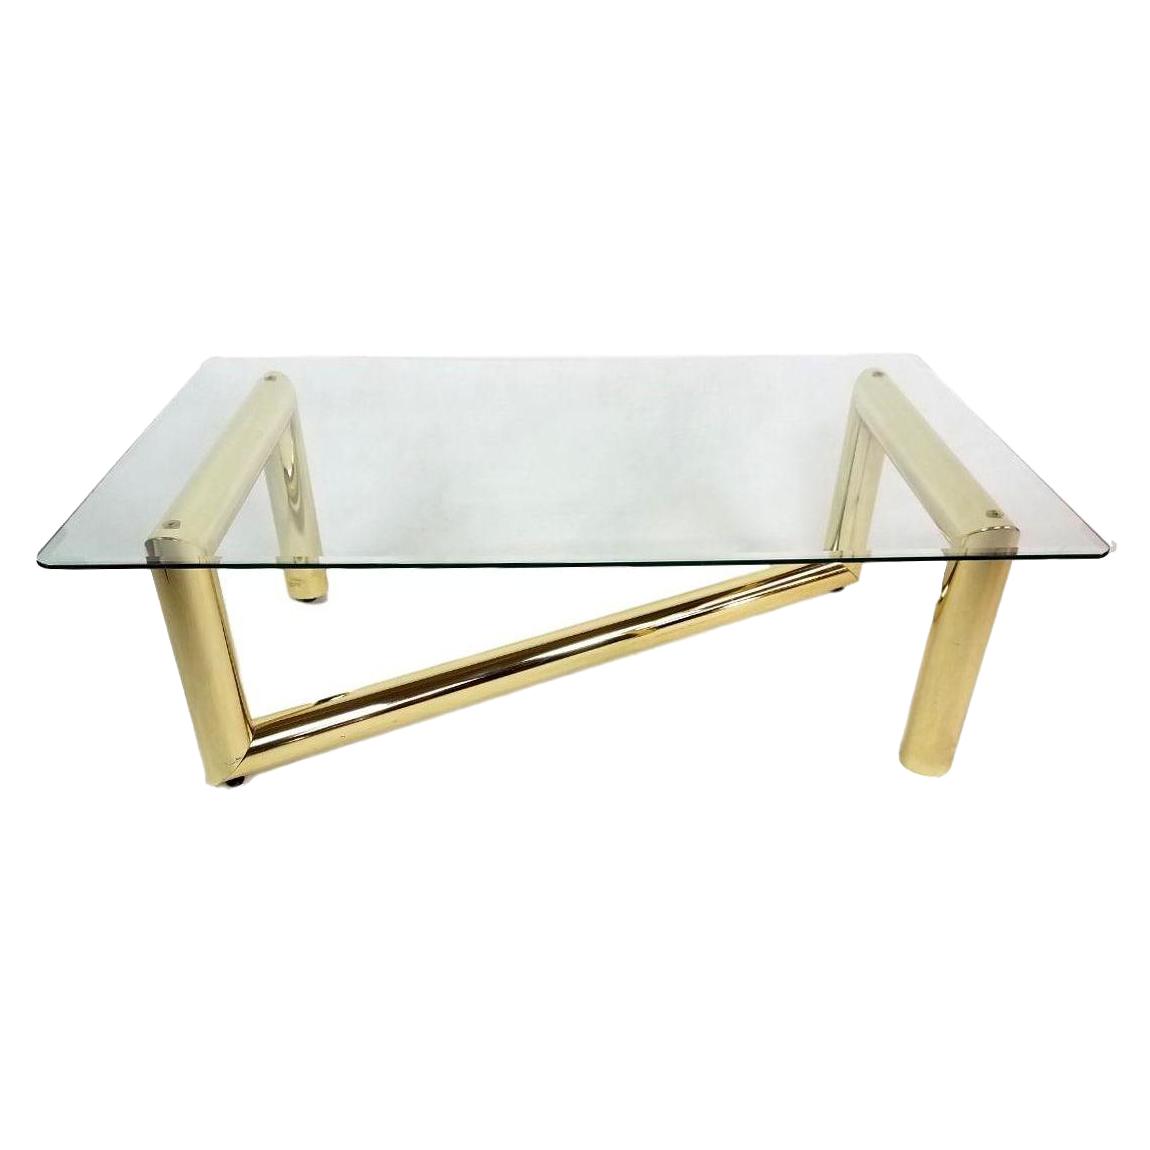 karl springer tubular brass z-shaped coffee table | chairish